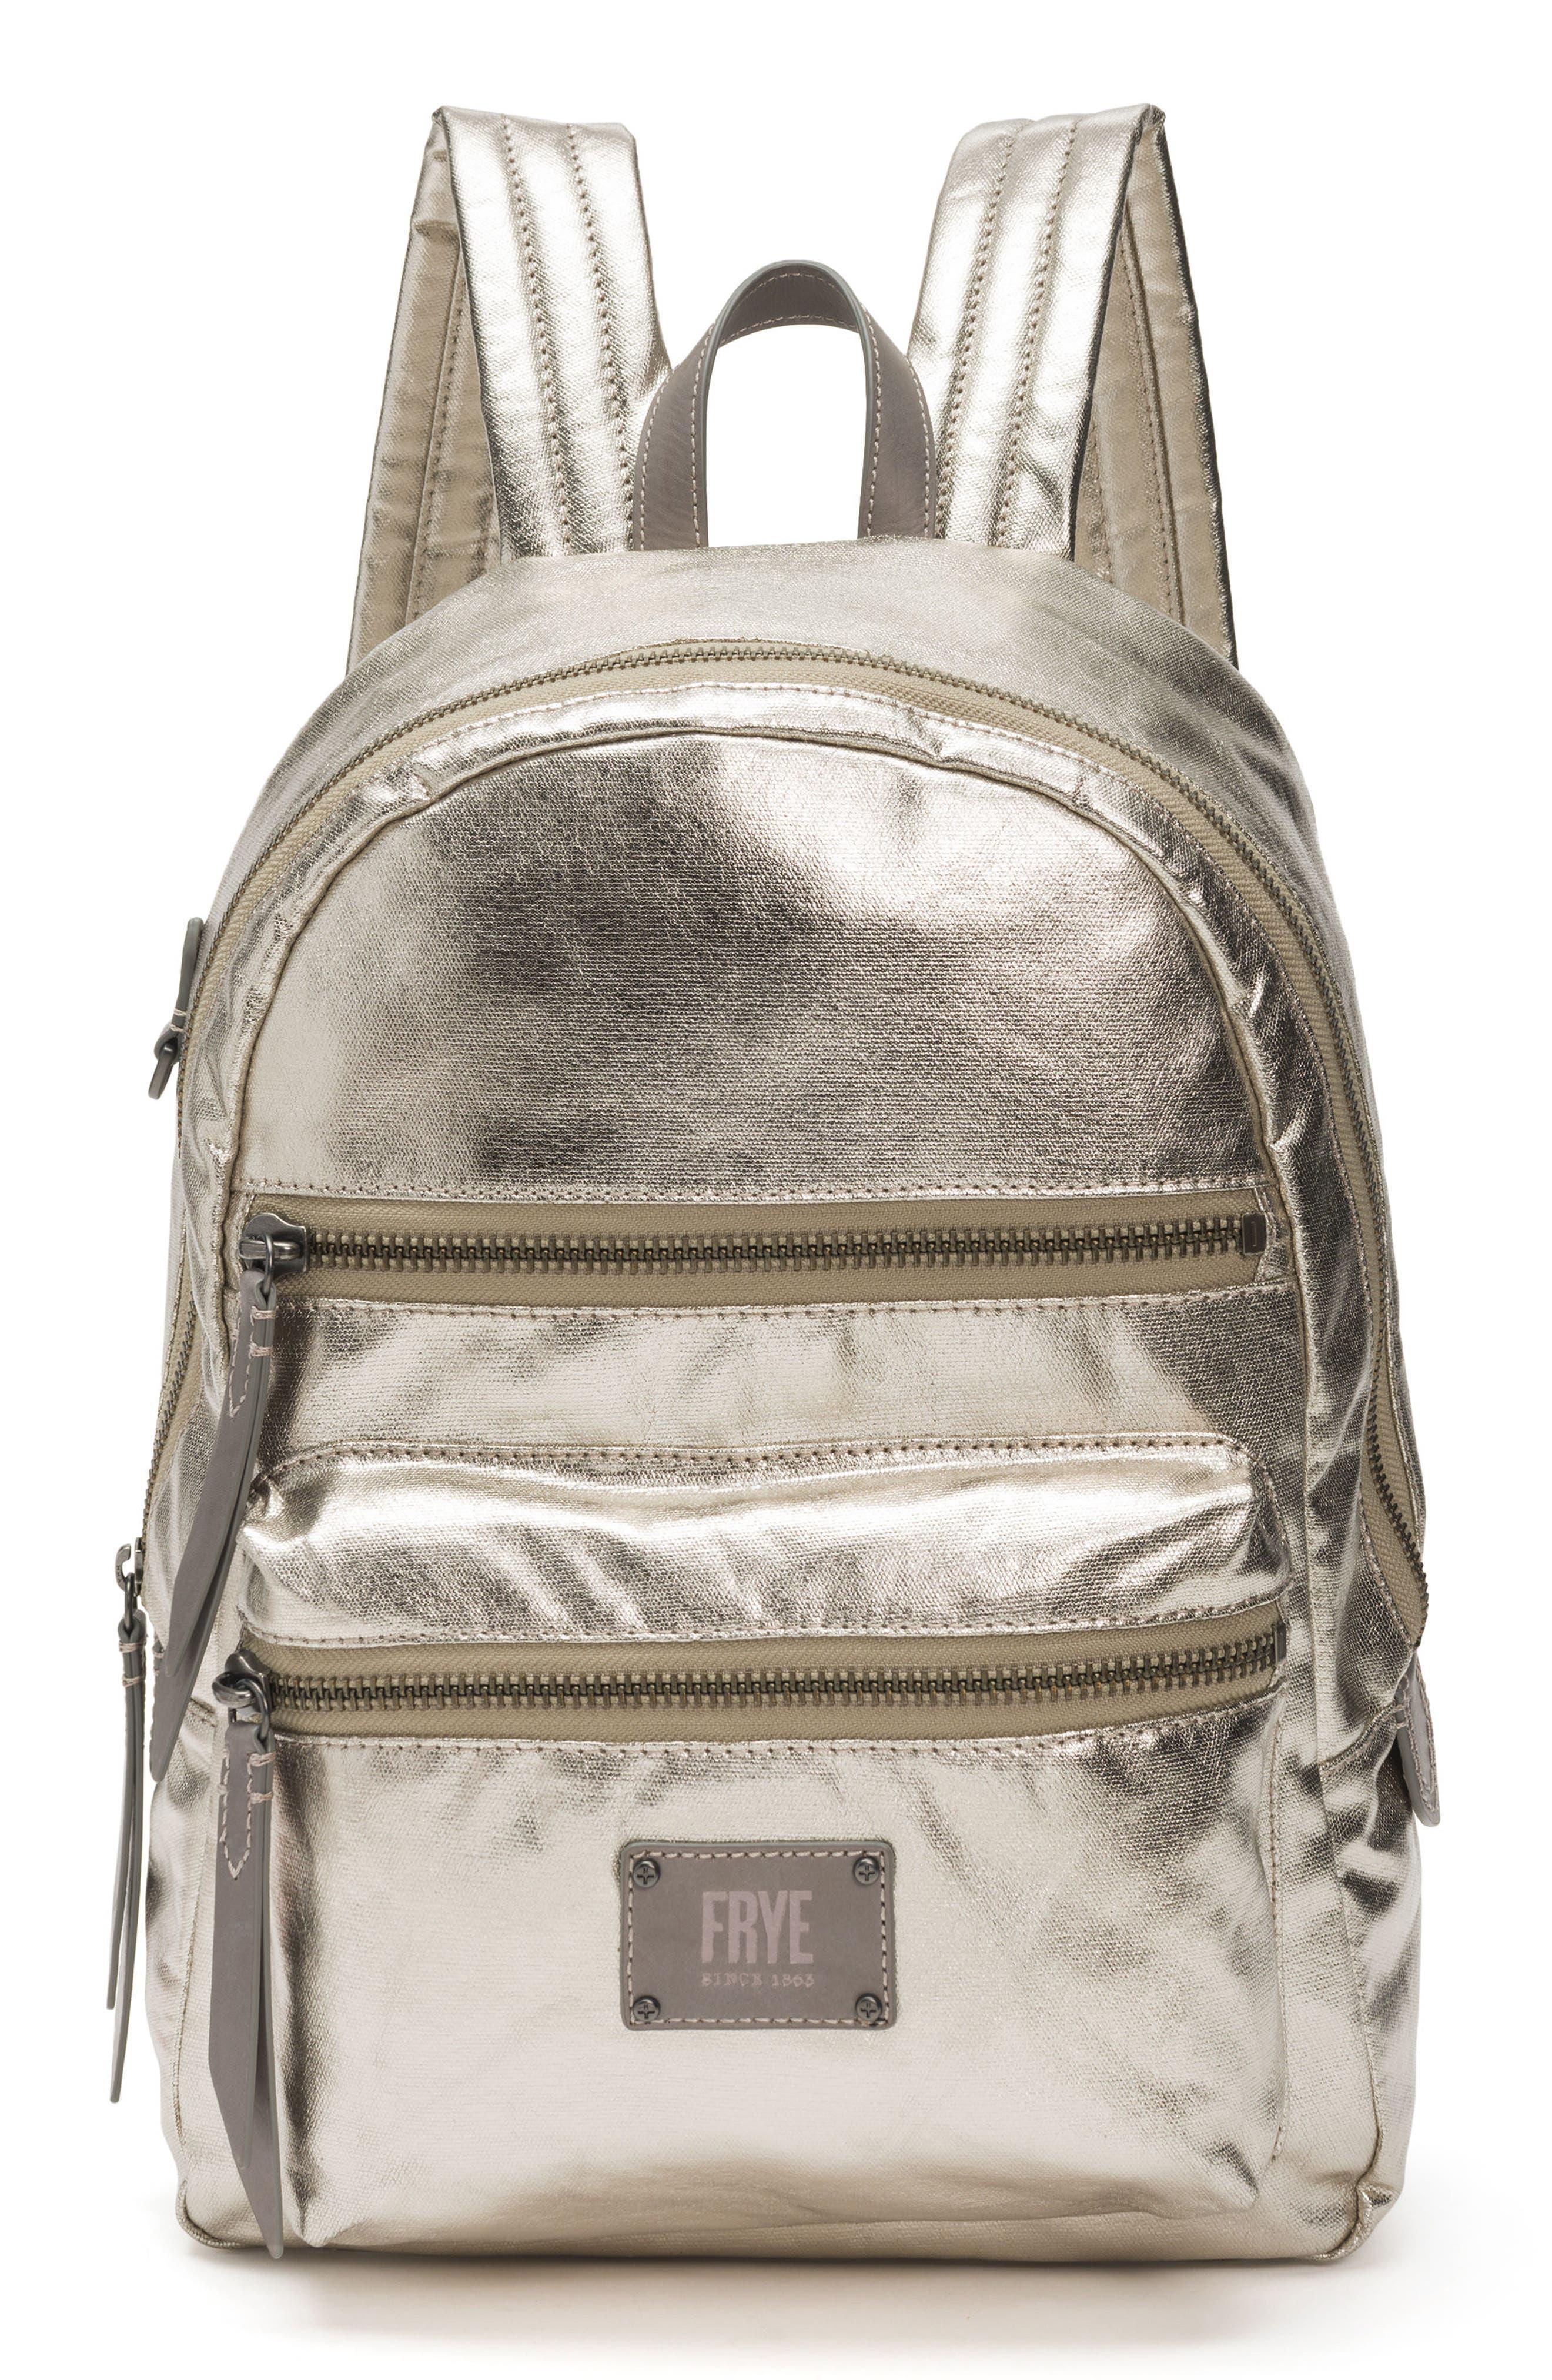 Ivy Metallic Nylon Backpack,                             Main thumbnail 1, color,                             020